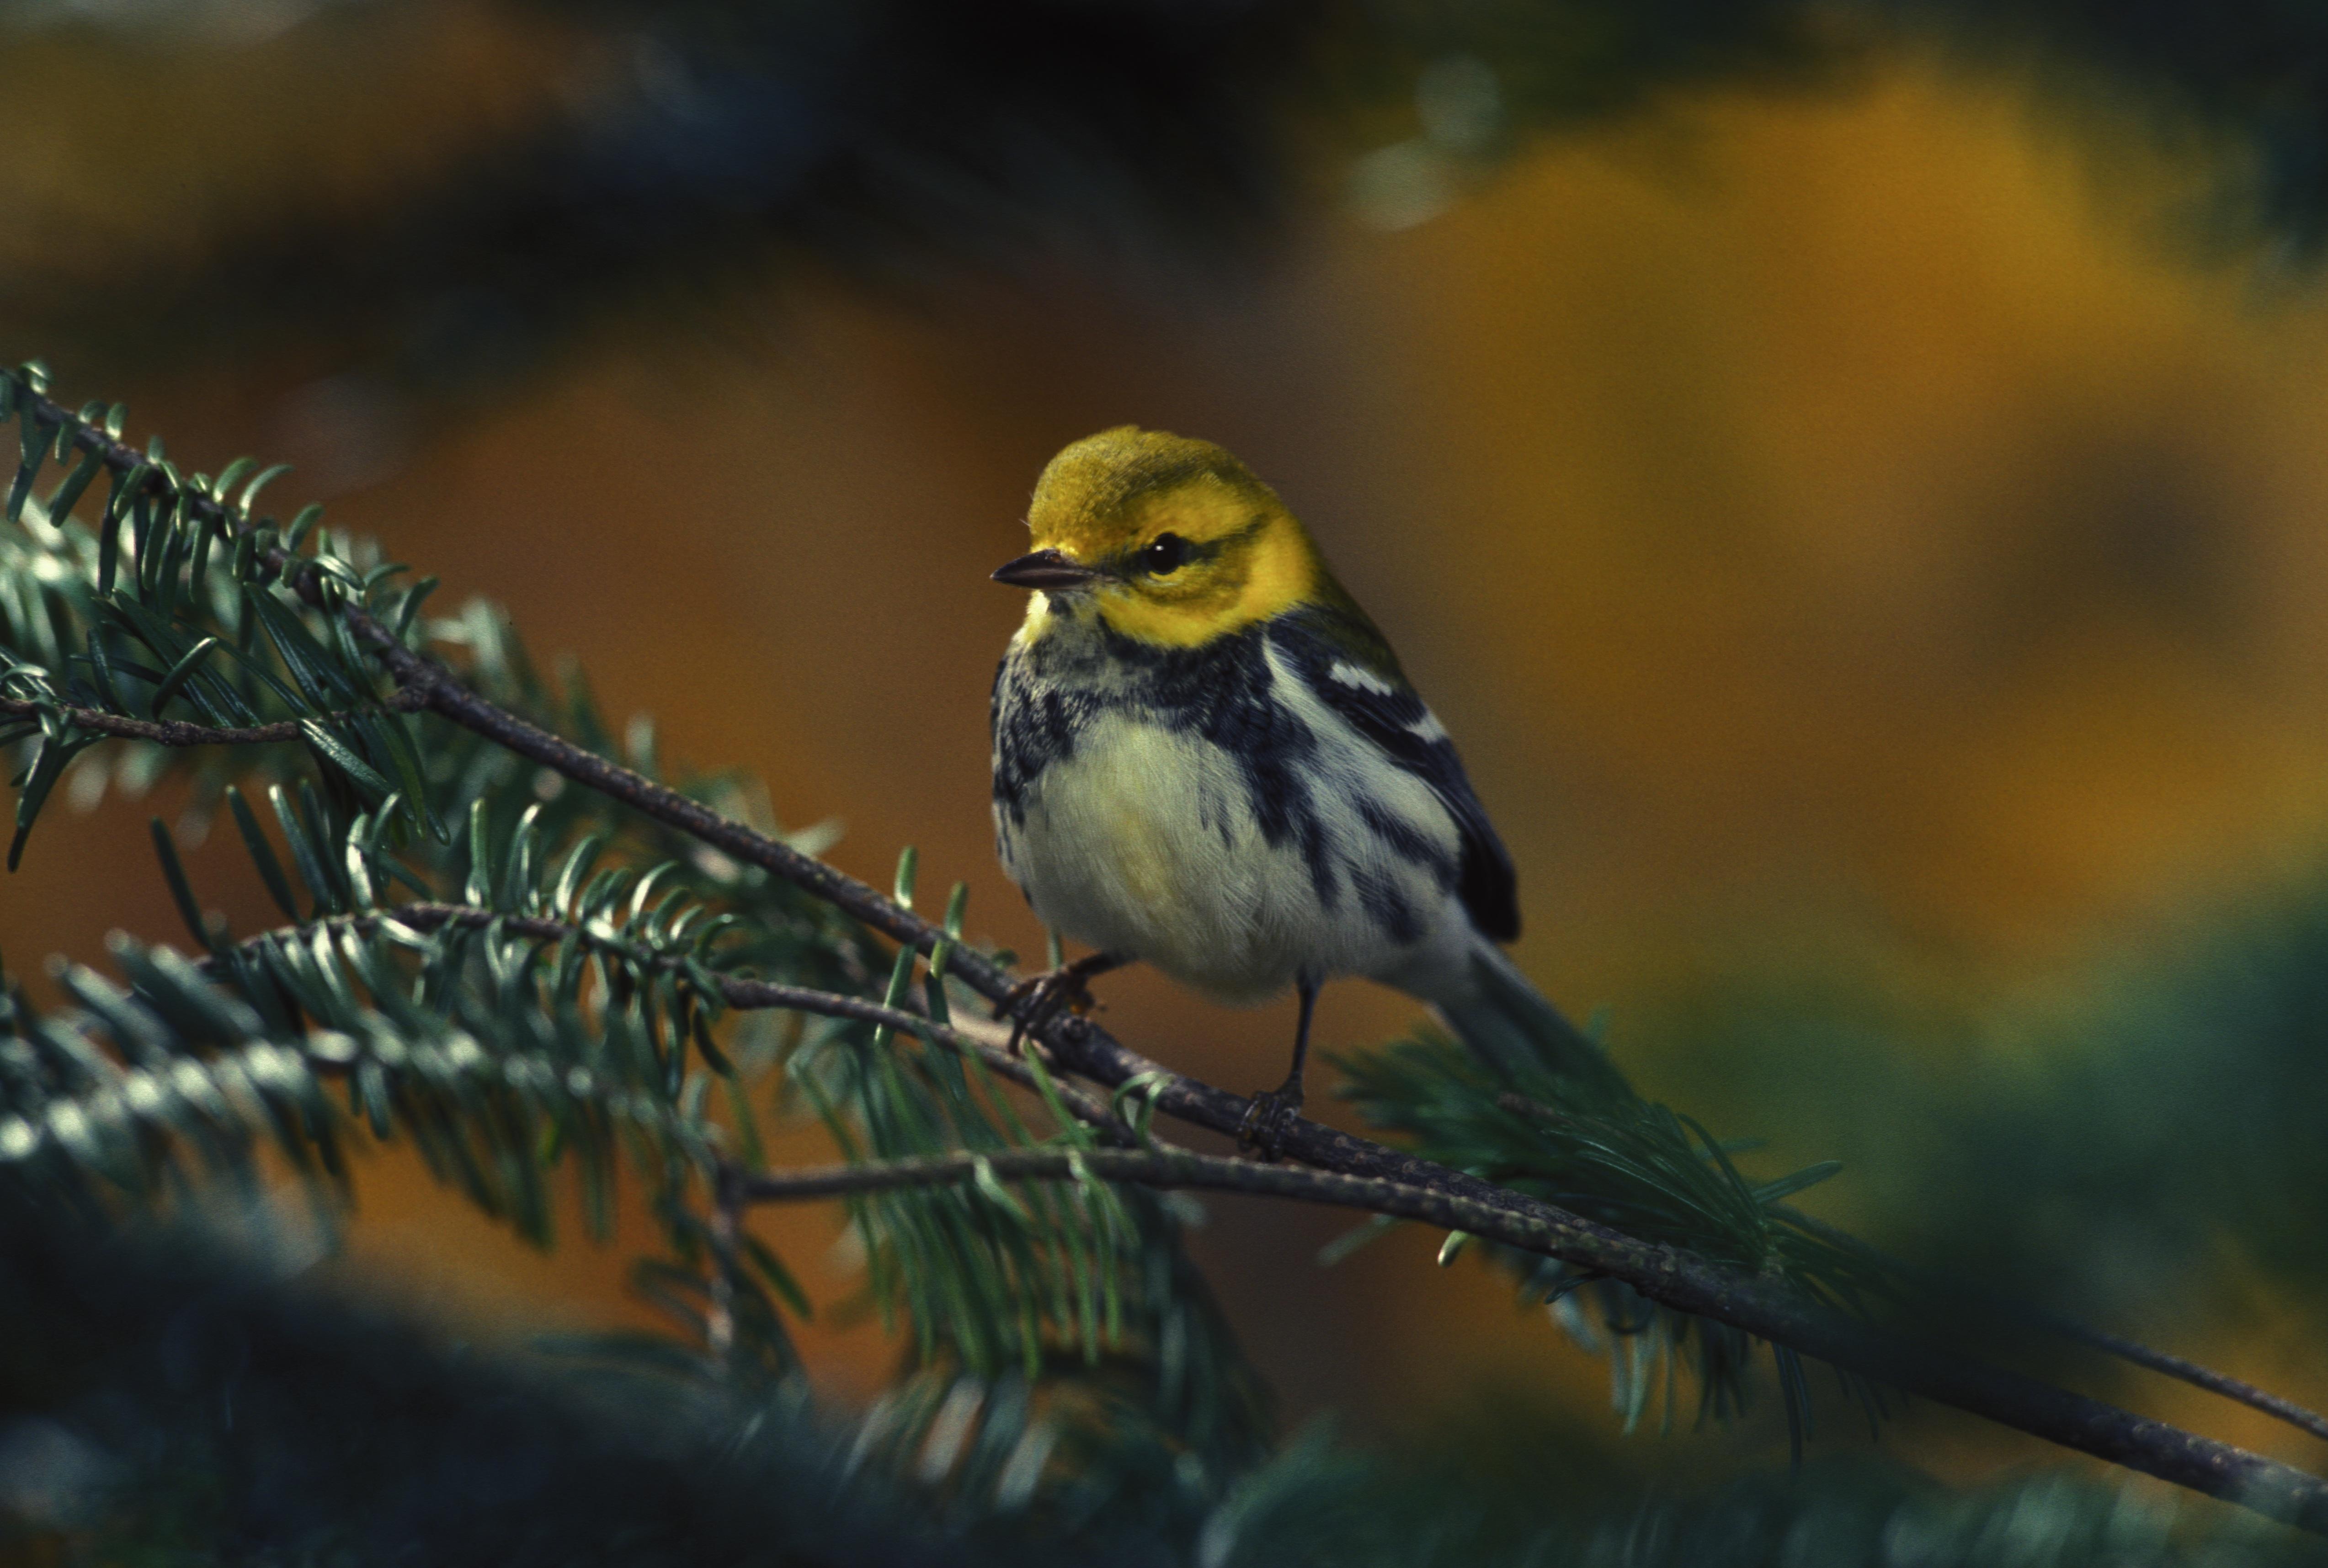 Bird on the branch photo